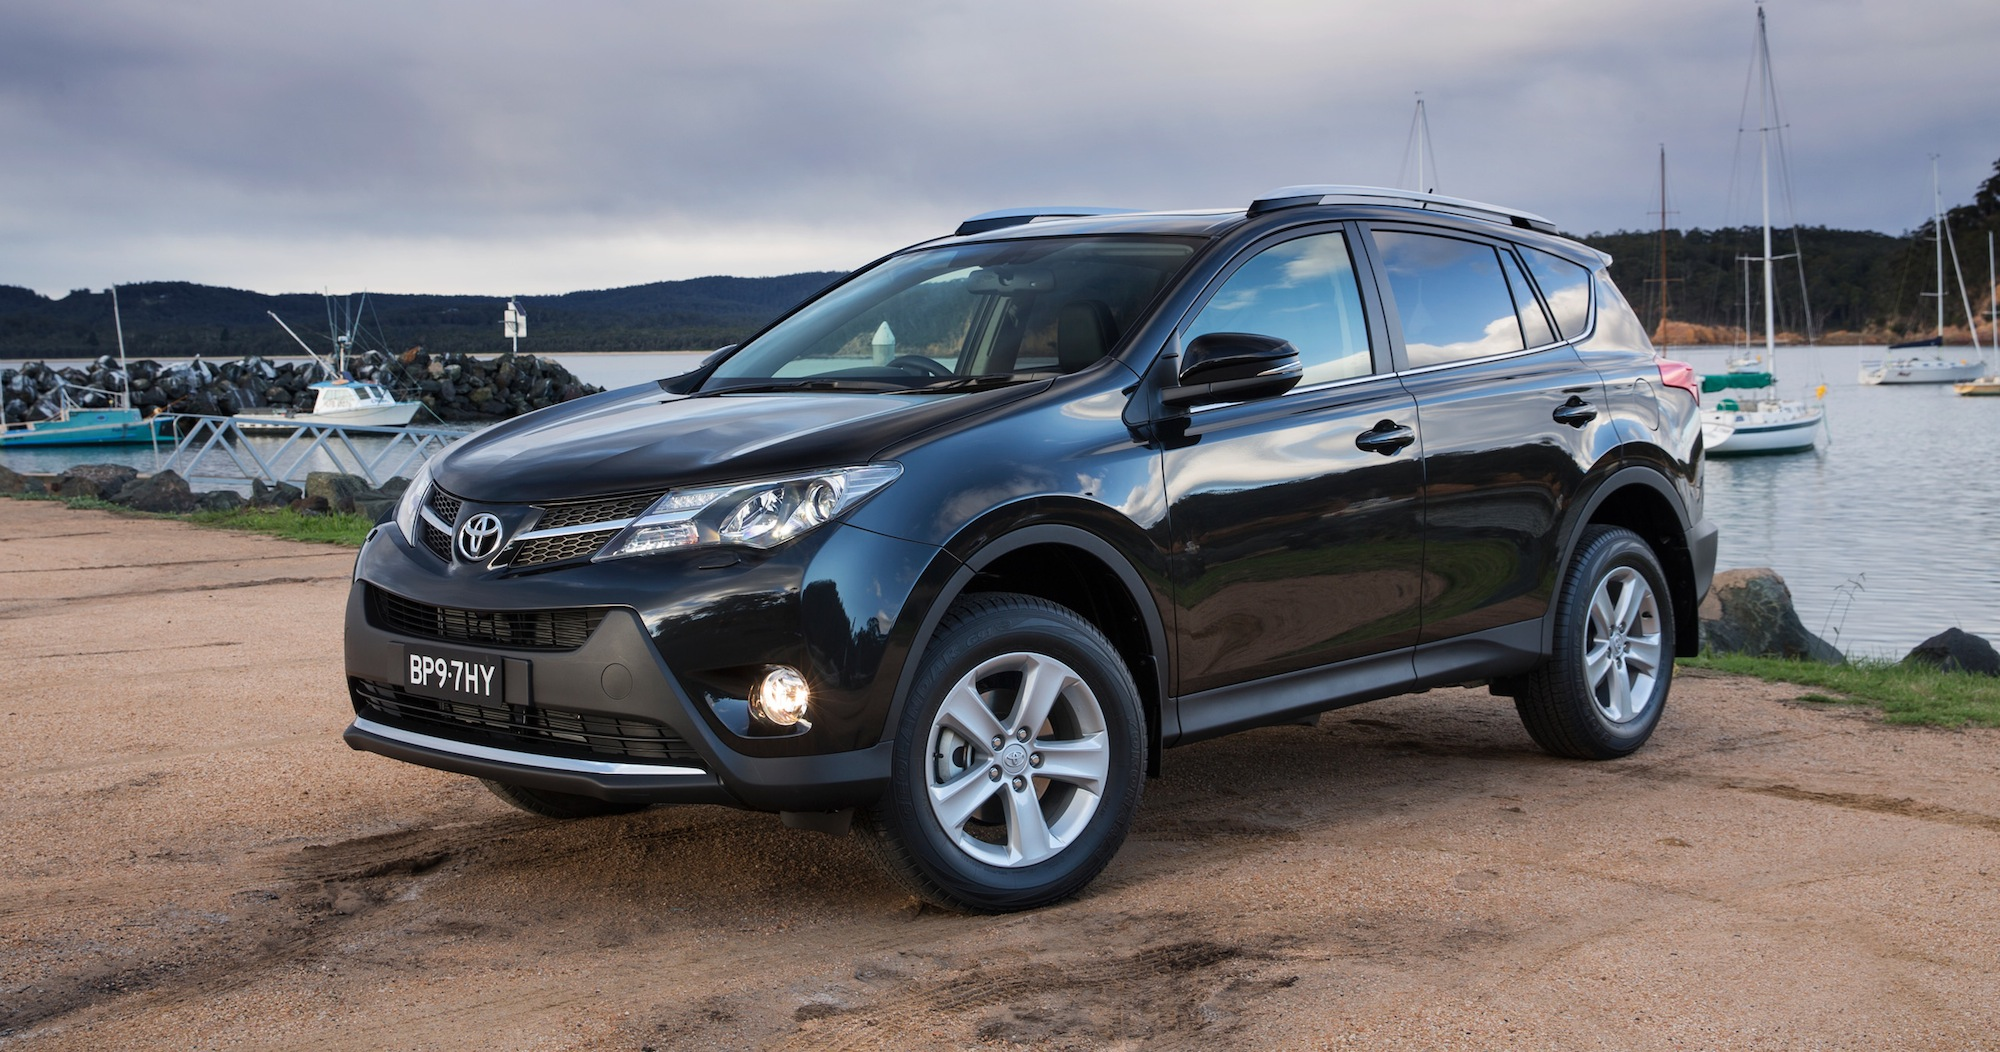 2014 Toyota Rav4 Prices Up Equipment Added Manual